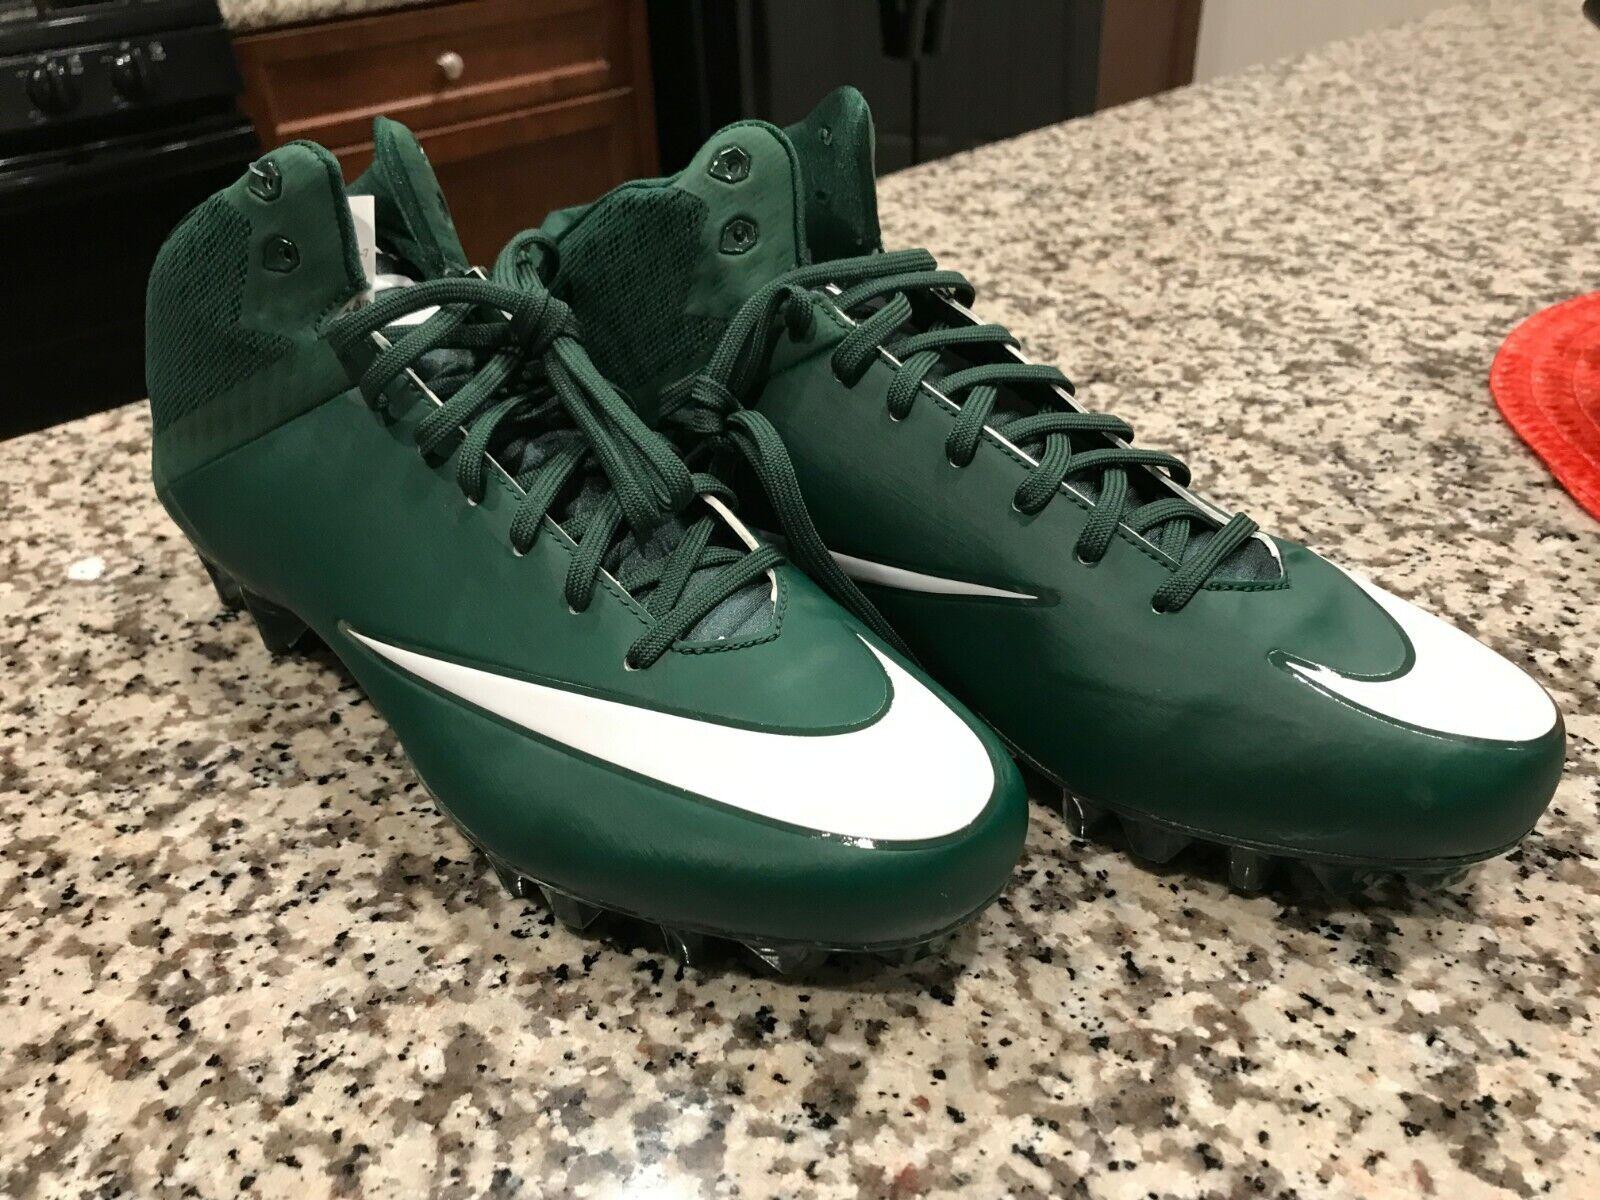 0715f4089d8 VAPOR SPEED 2 4 TD CF Green White FOOTBALL CLEATS SIZE 13.5 847089-312 NIKE  3 oowloh5950-Men